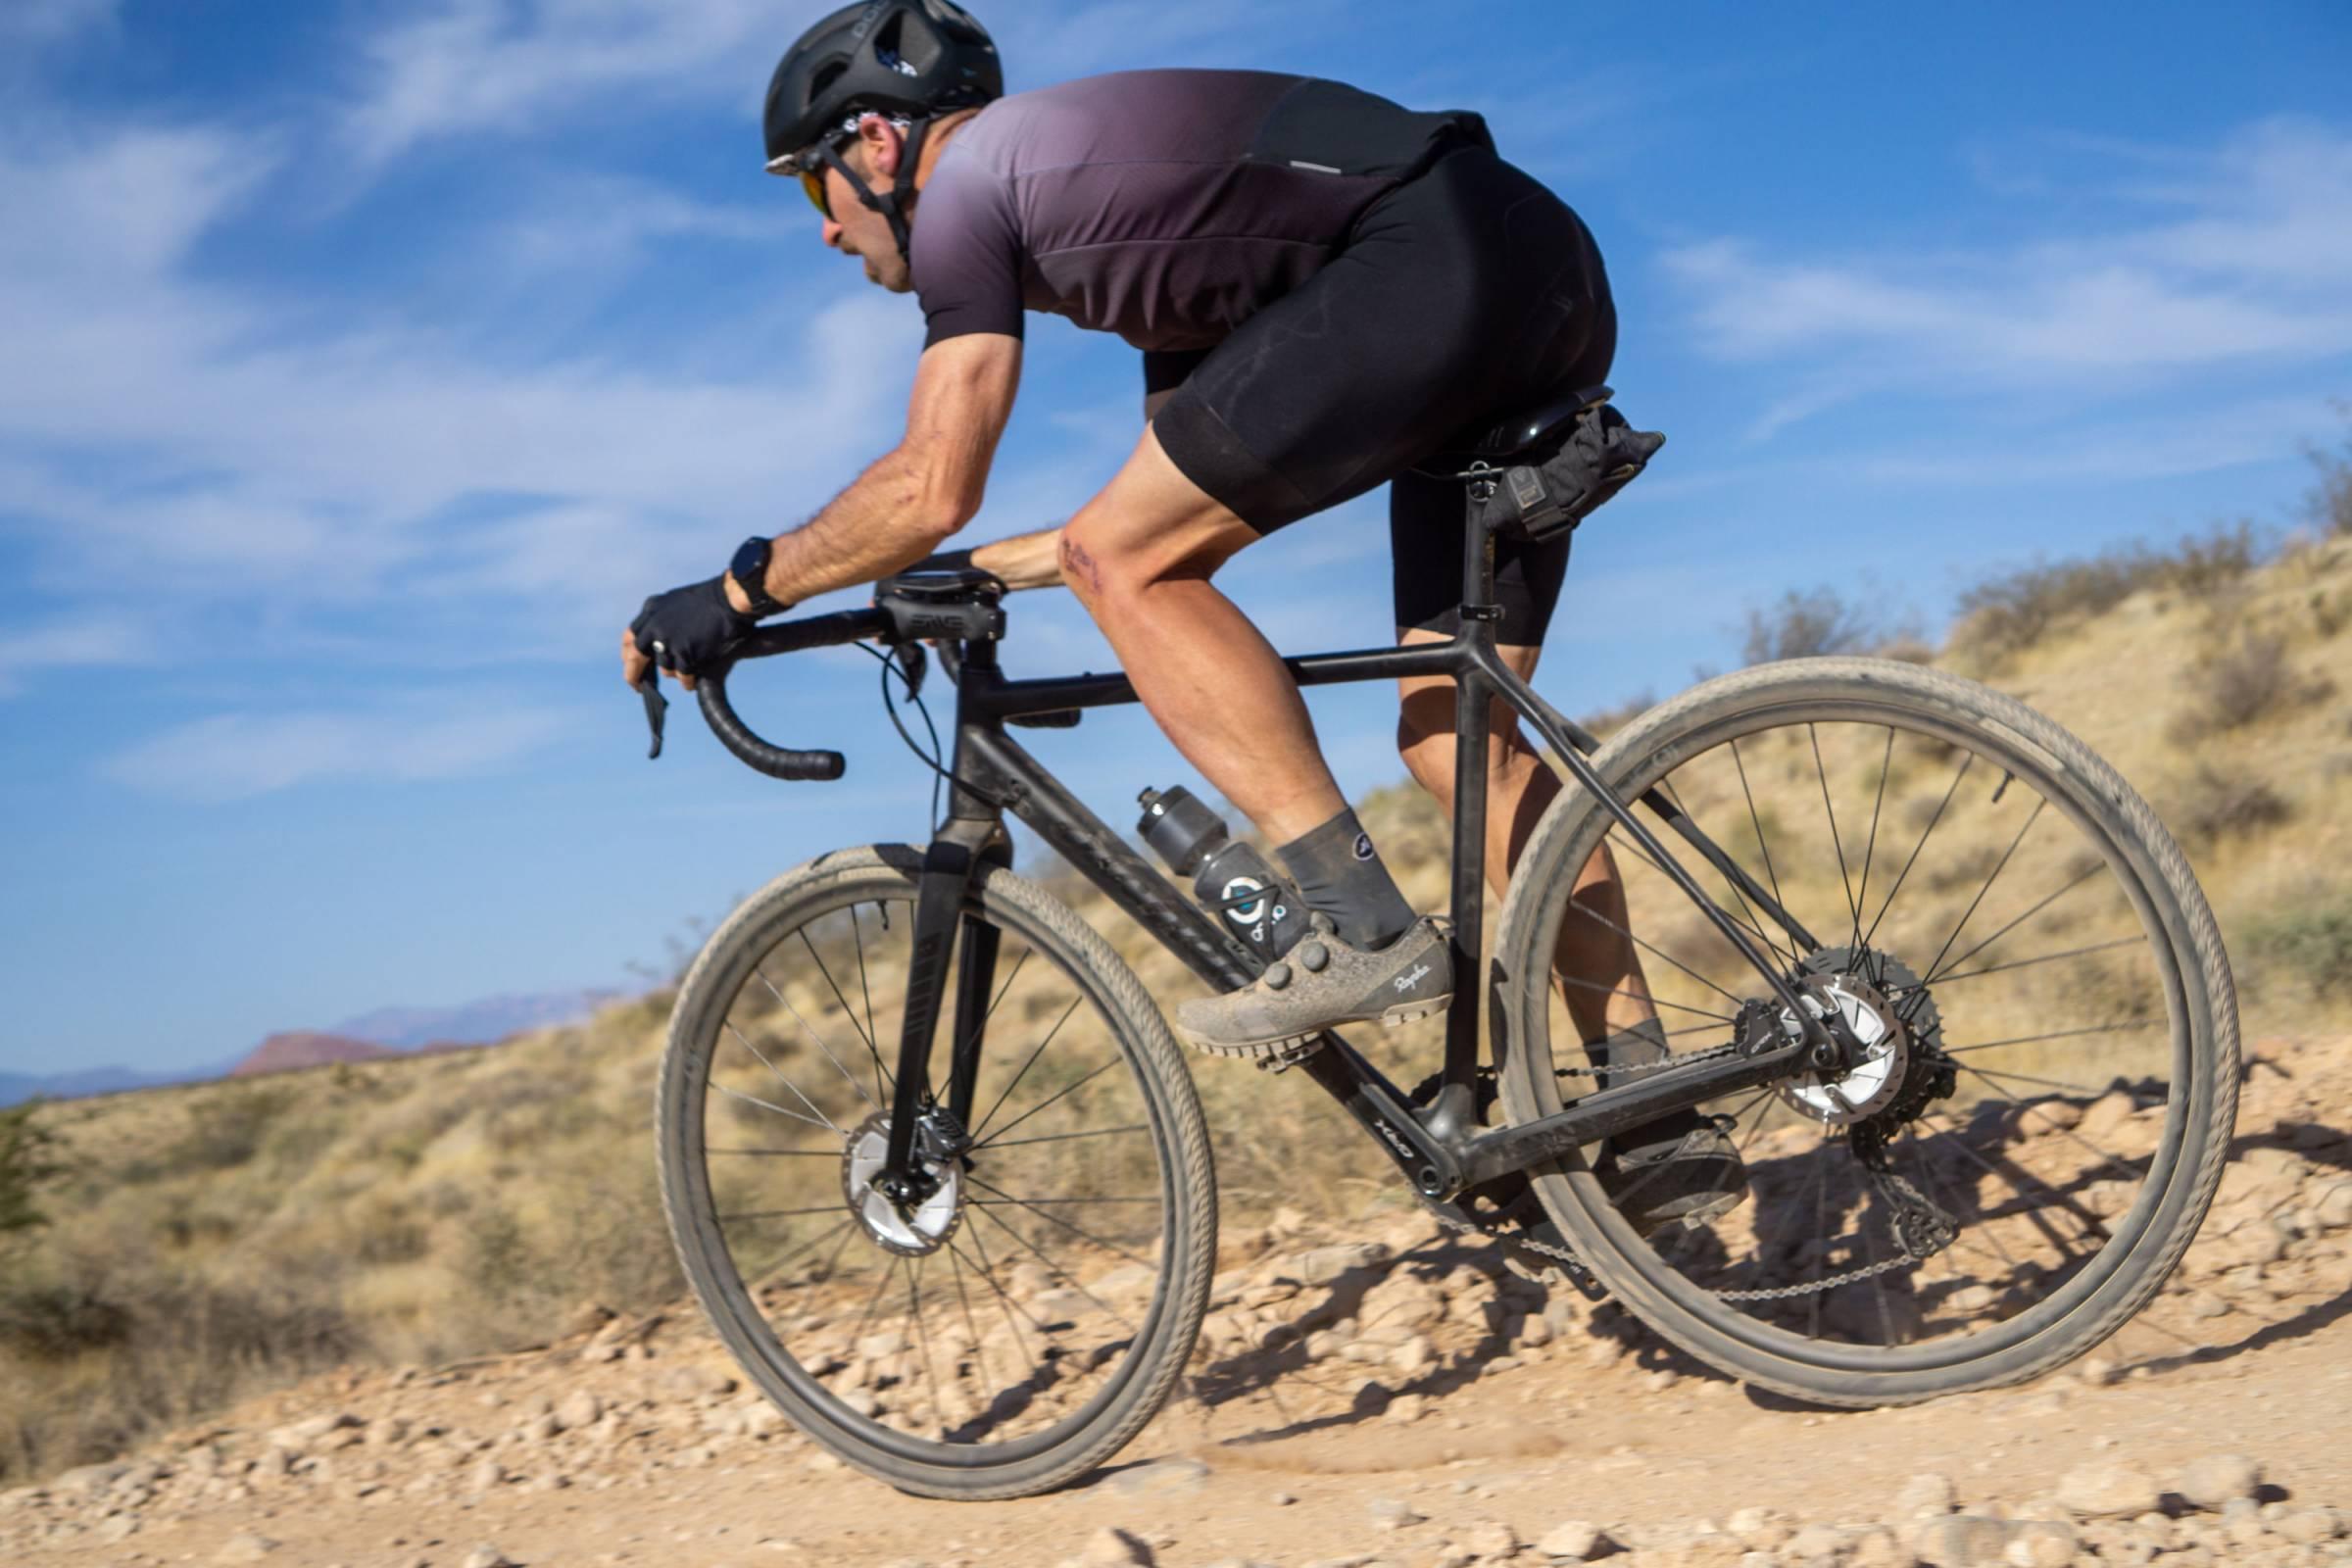 Best cycling bibs for men